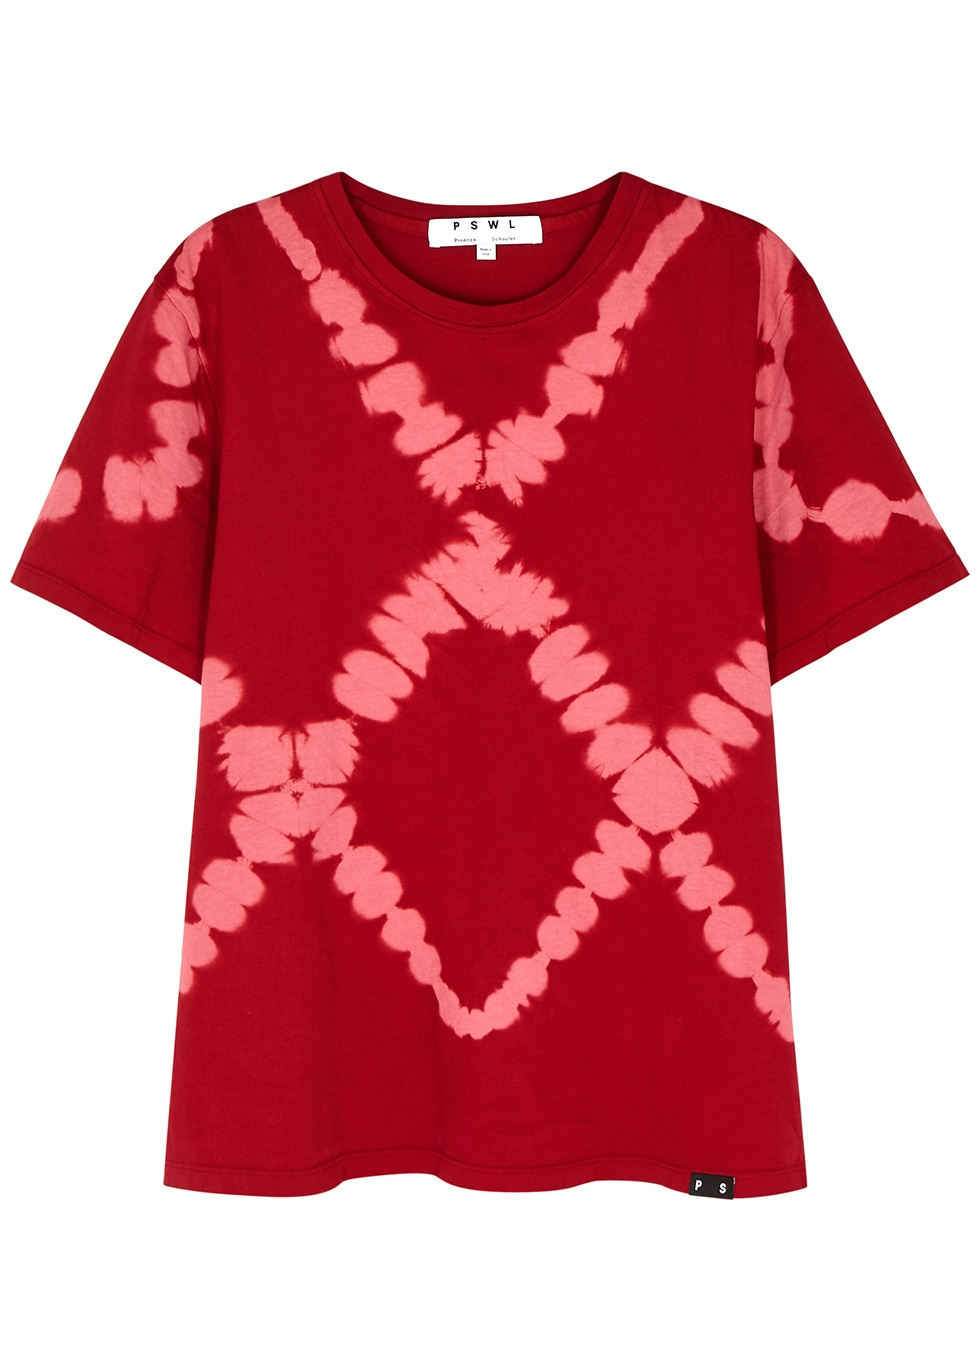 e4e577a0f77a Women's Designer T-Shirts - Cotton, Linen & Striped - Harvey Nichols